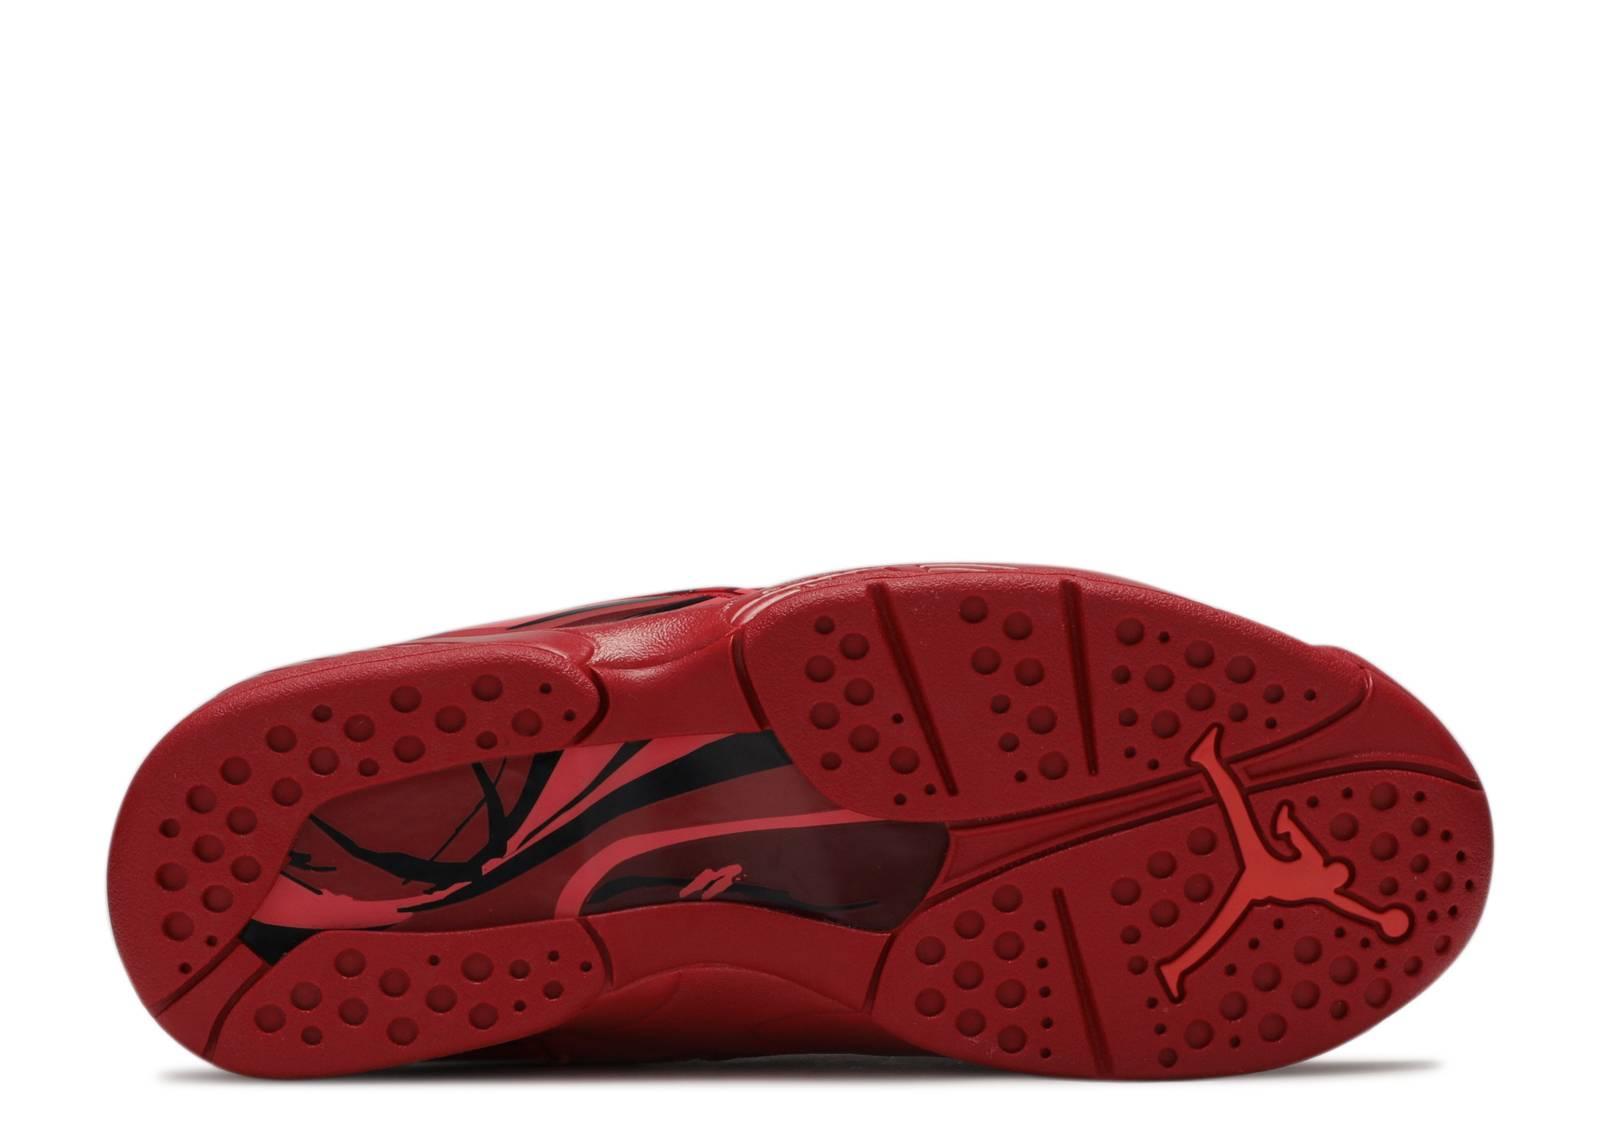 99484db9bfa55a Wmns Air Jordan 8 Vday